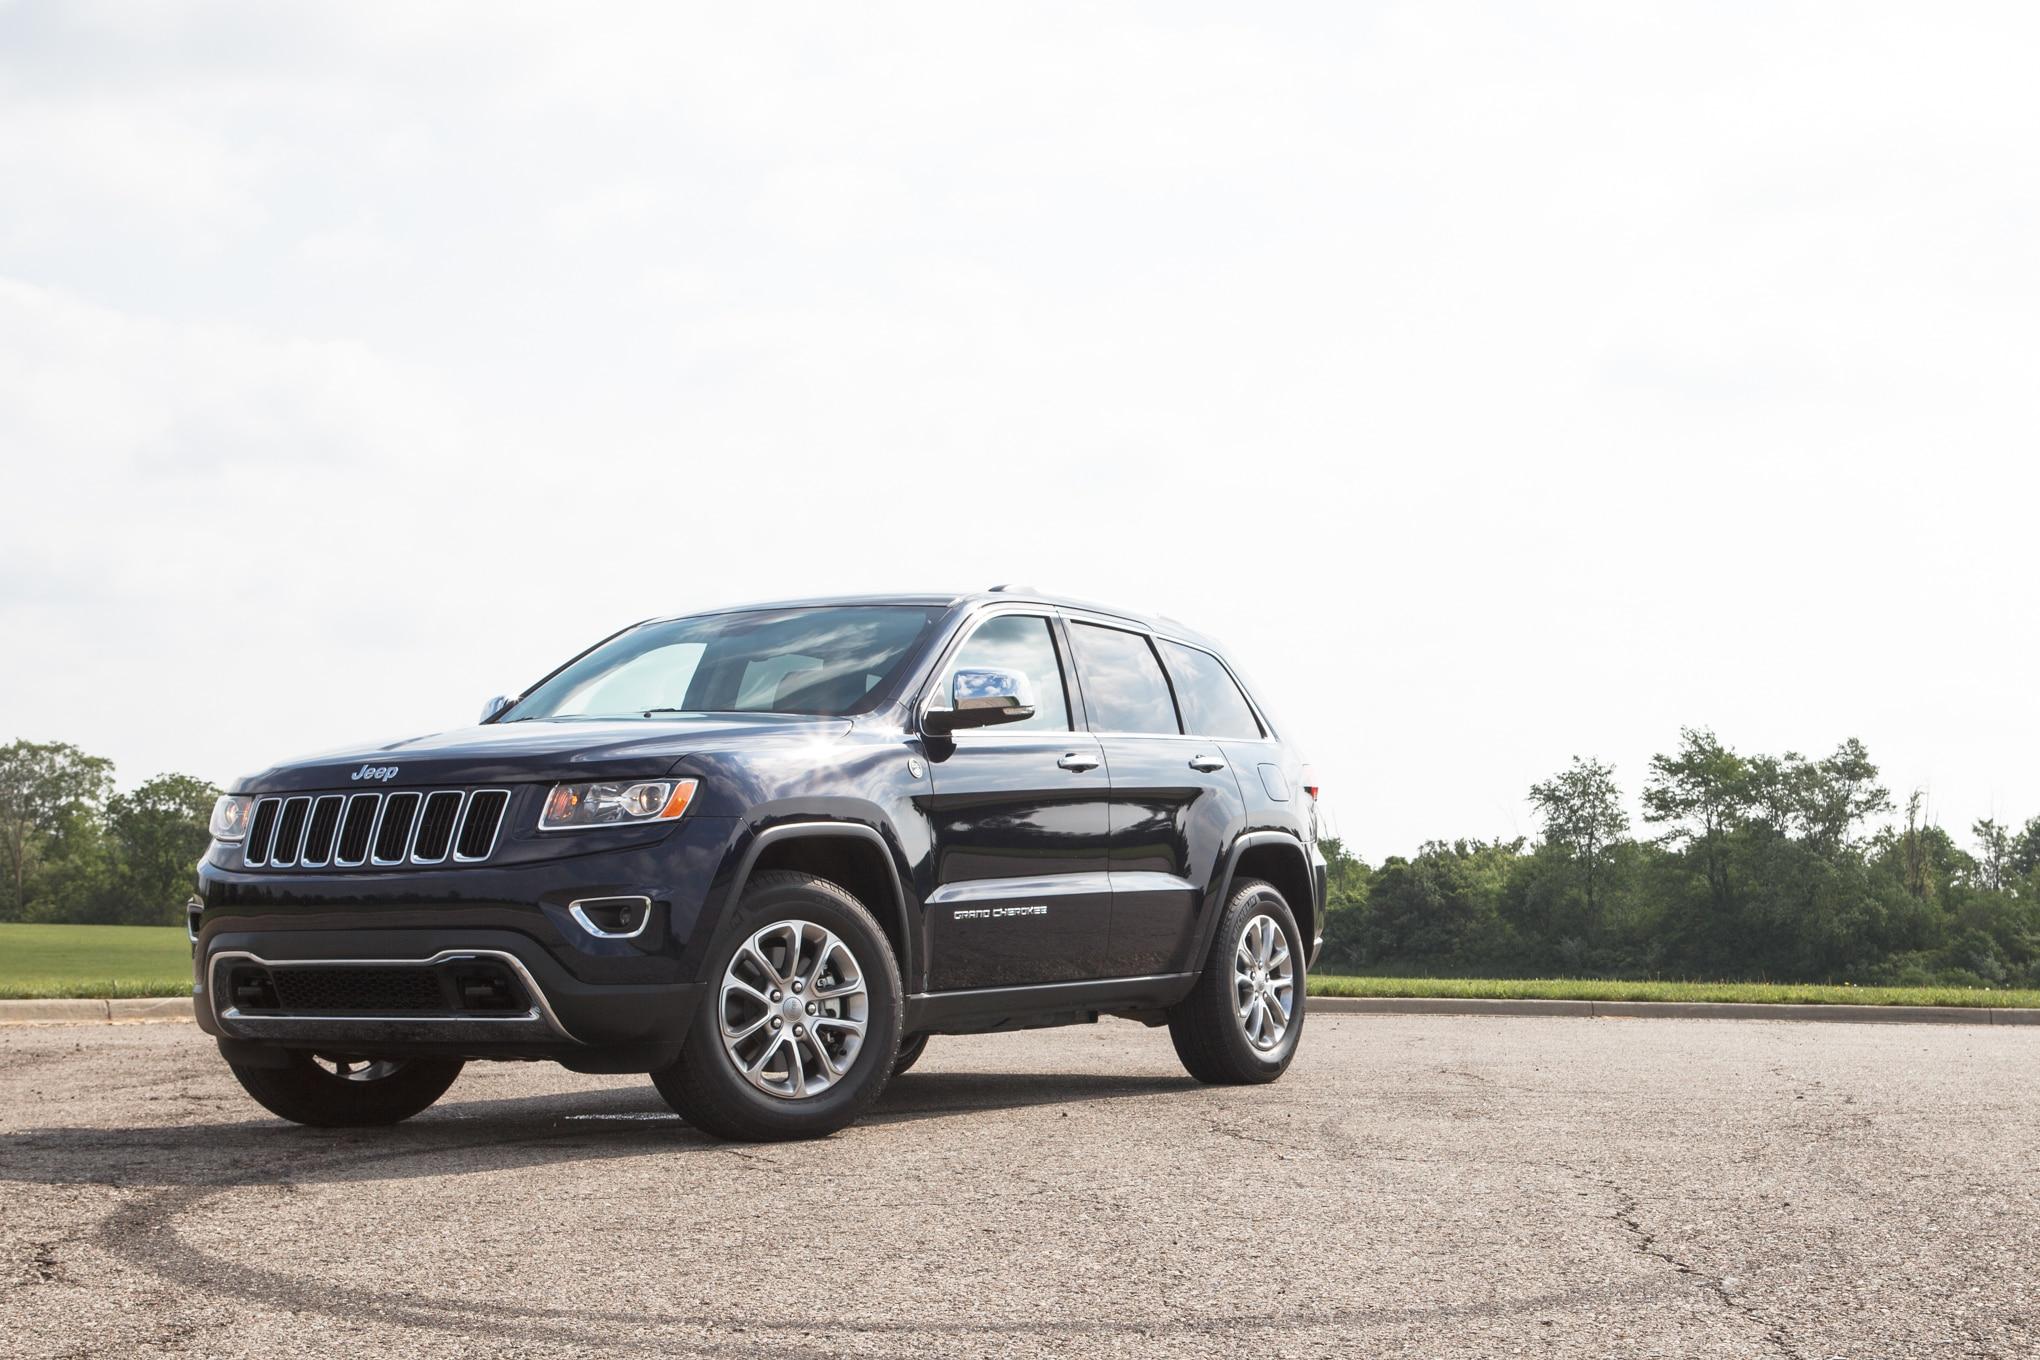 2014 jeep grand cherokee limited 4x4 editors 39 notebook automobile magazine. Black Bedroom Furniture Sets. Home Design Ideas